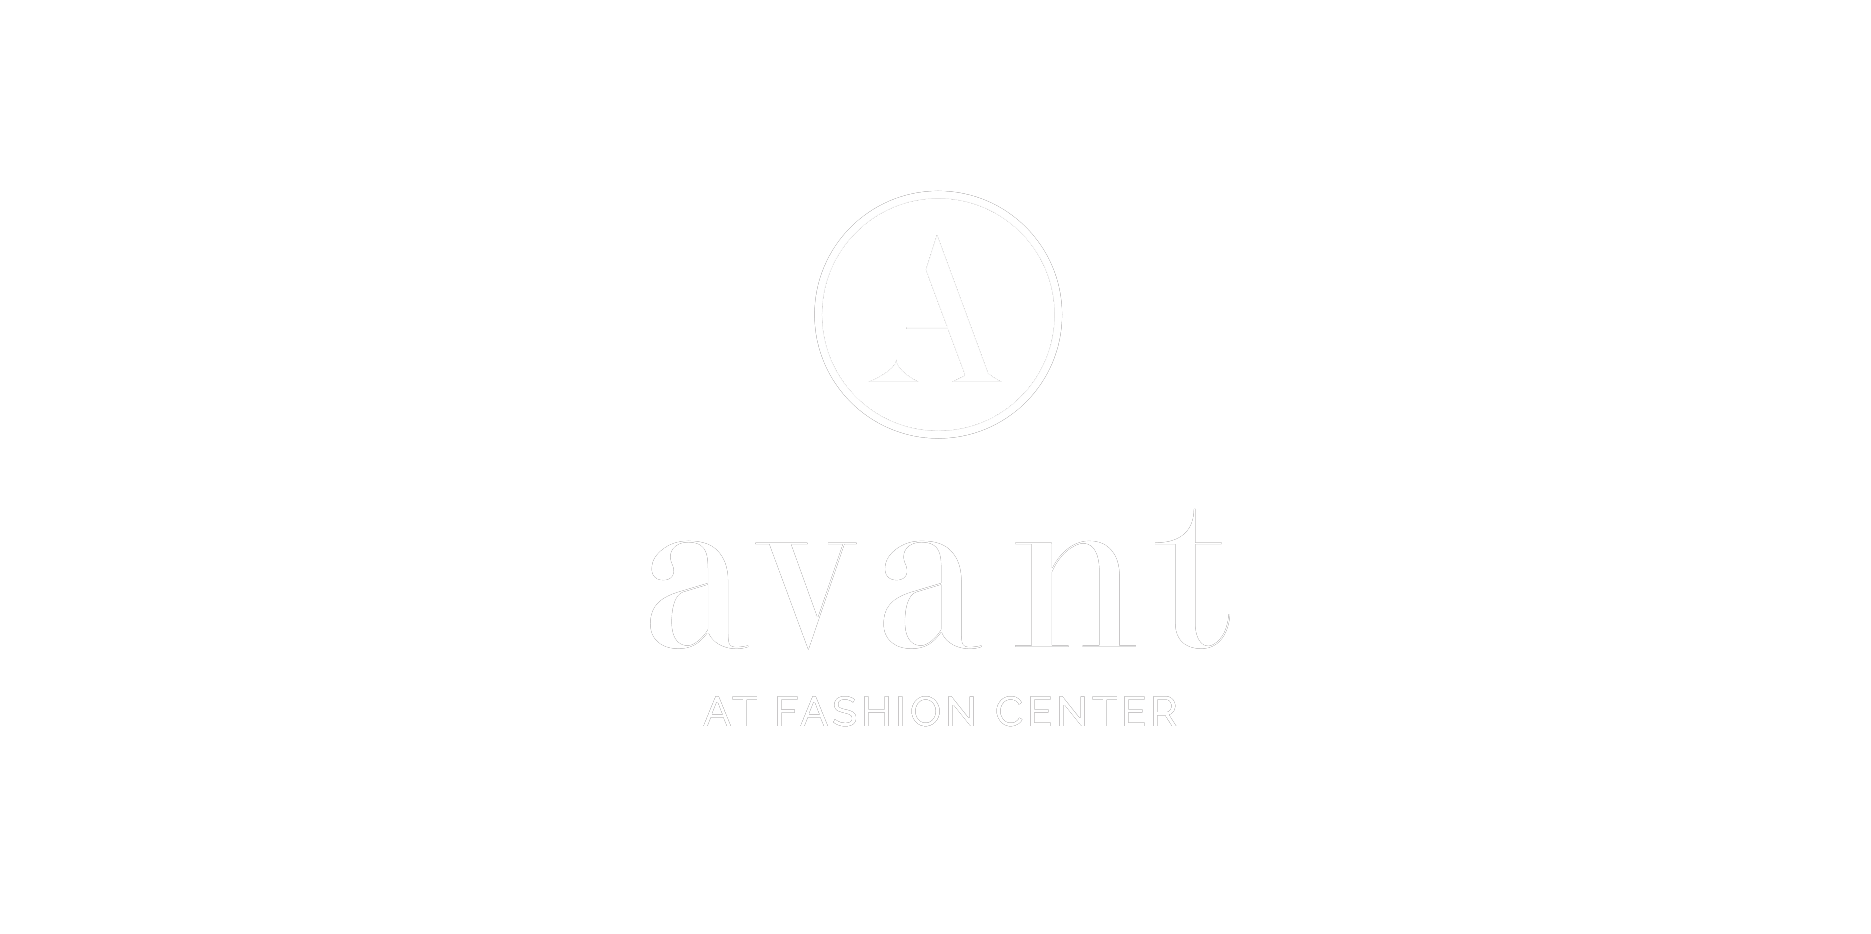 Avant at Fashion Center logo